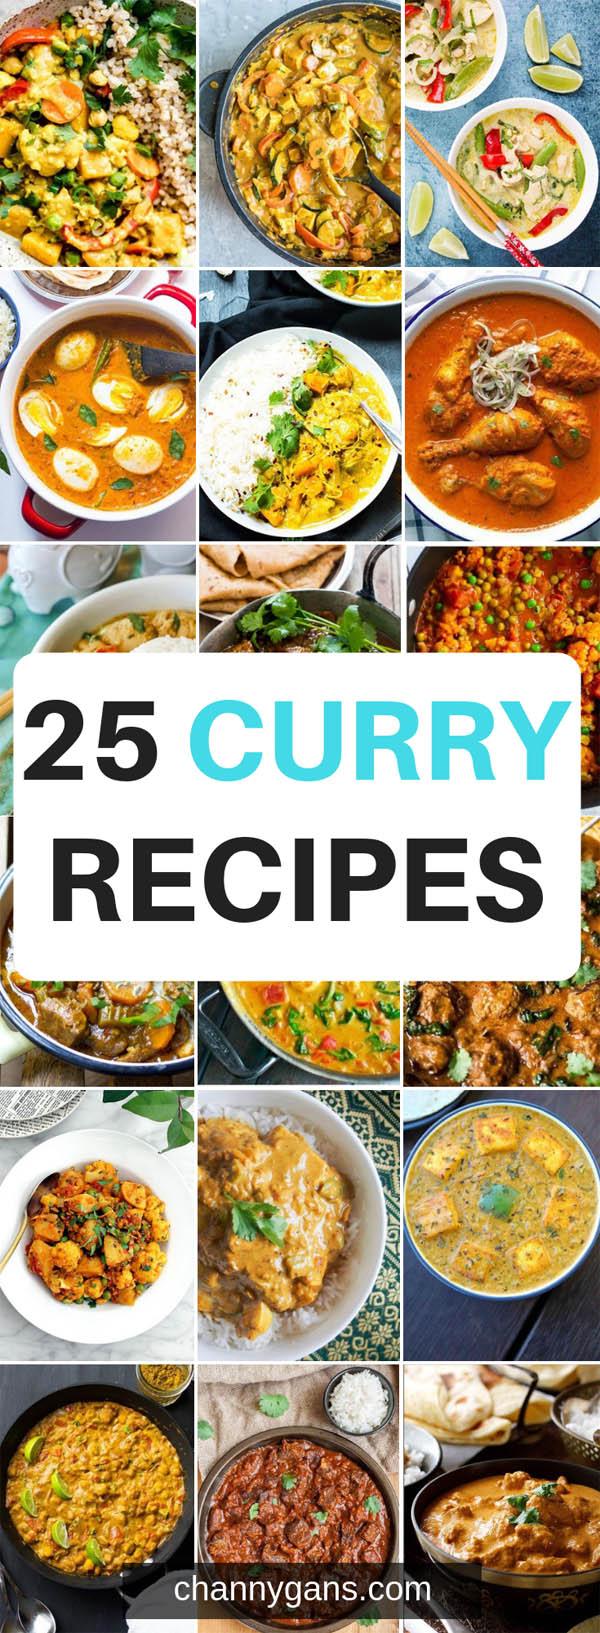 25 Curry Recipes